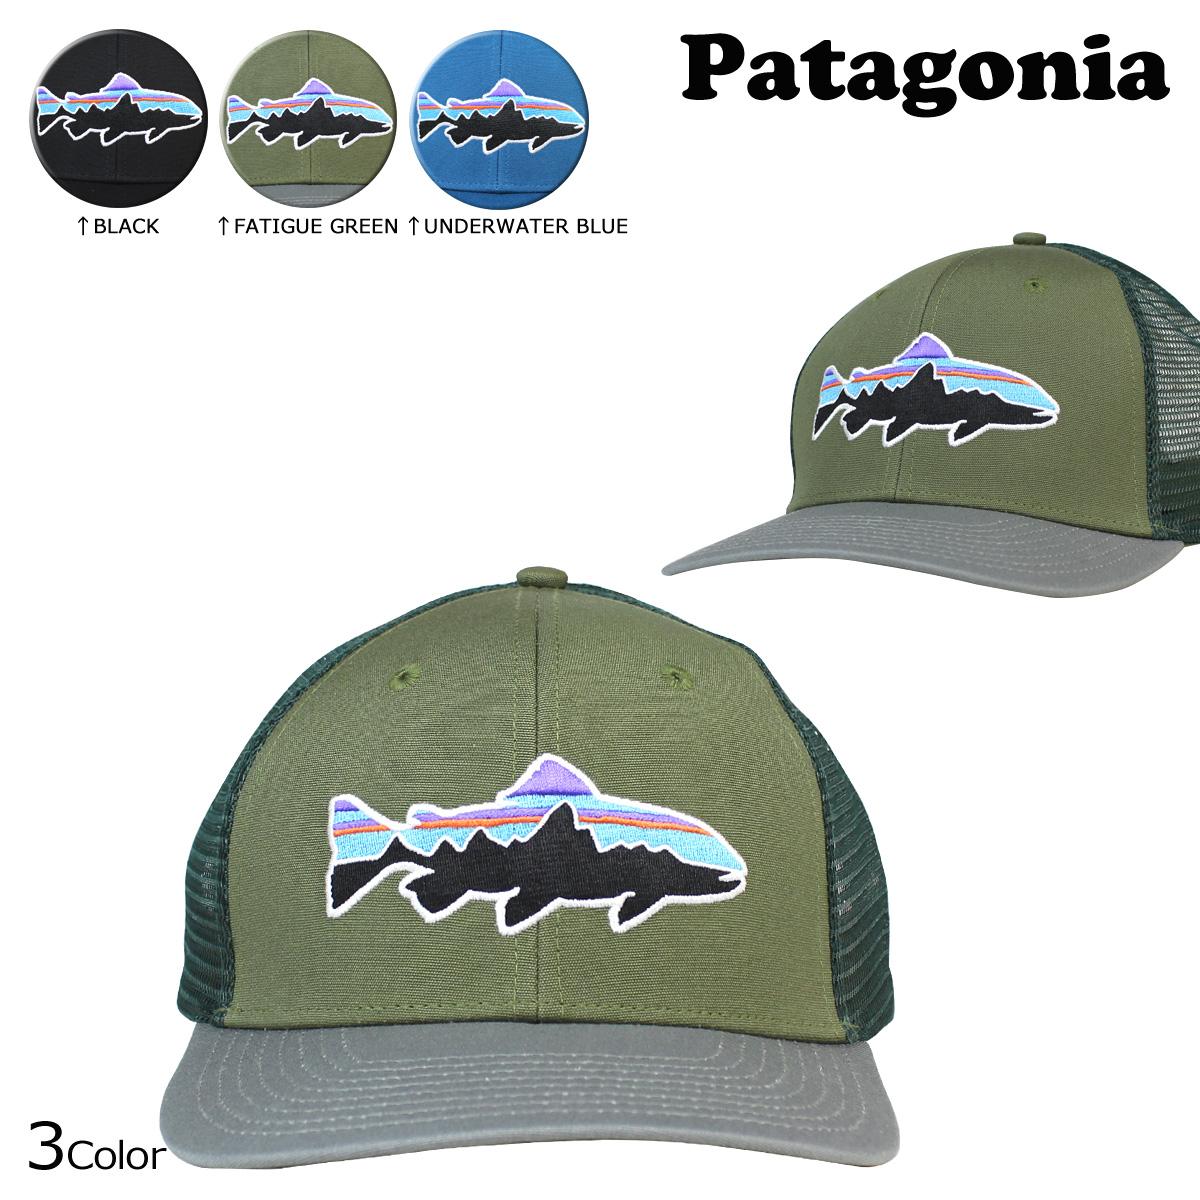 575d354afd0 ALLSPORTS  Patagonia patagonia men s Cap snap back Cap 38008 3 color ...